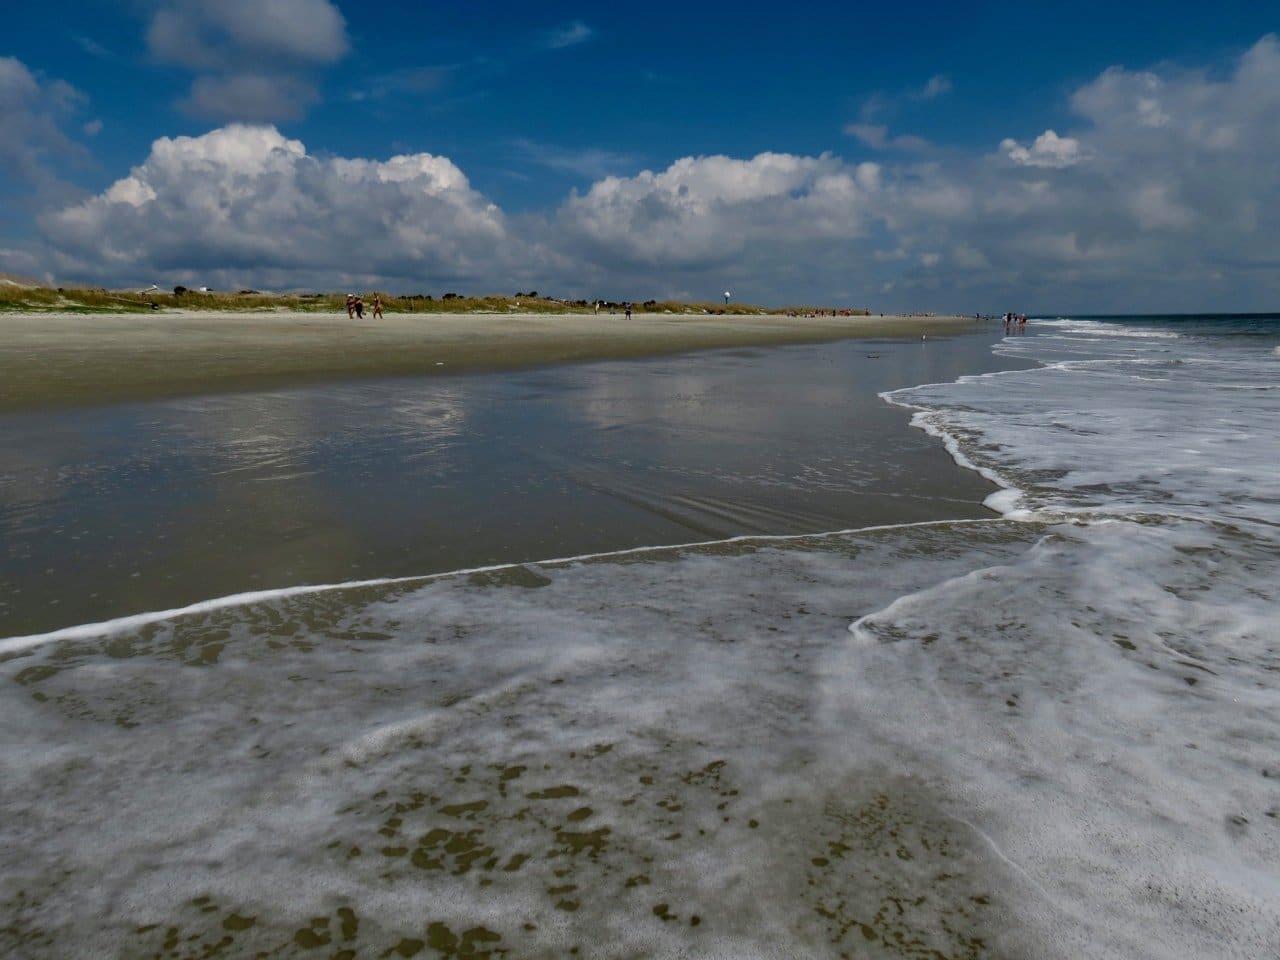 The beach on Tybee Island